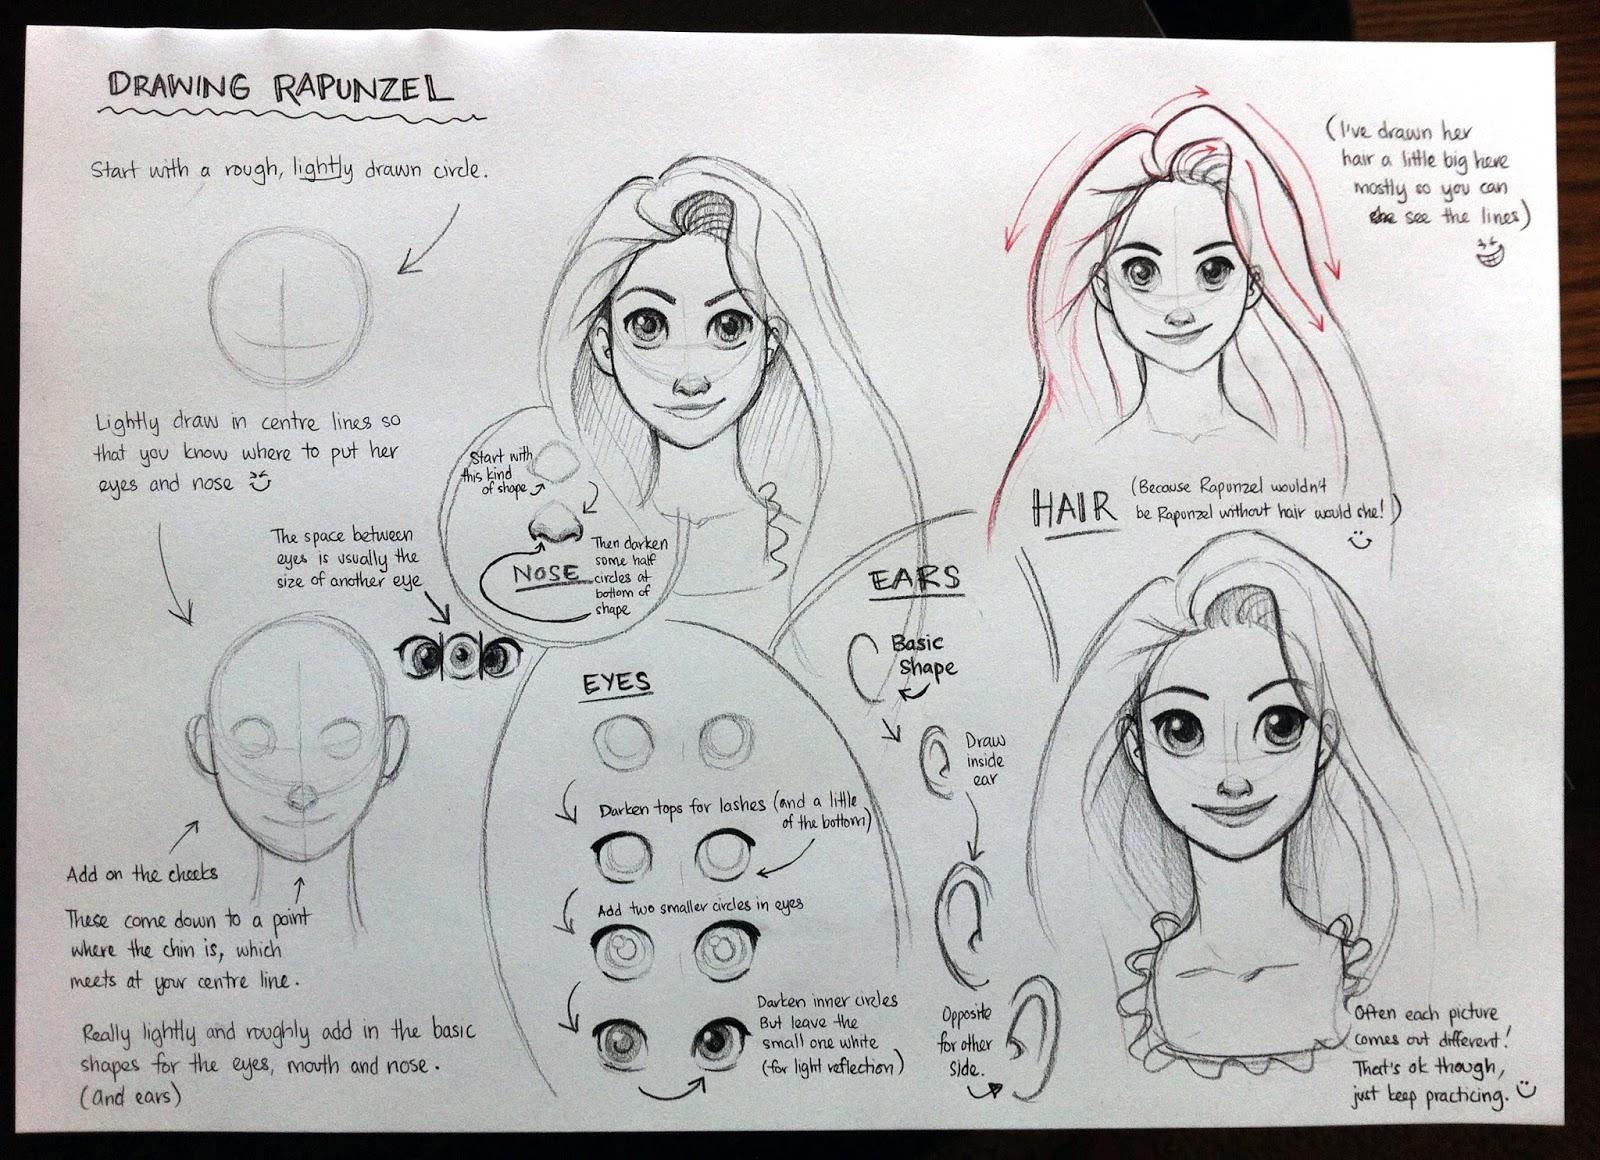 how to draw rapunzel with braid